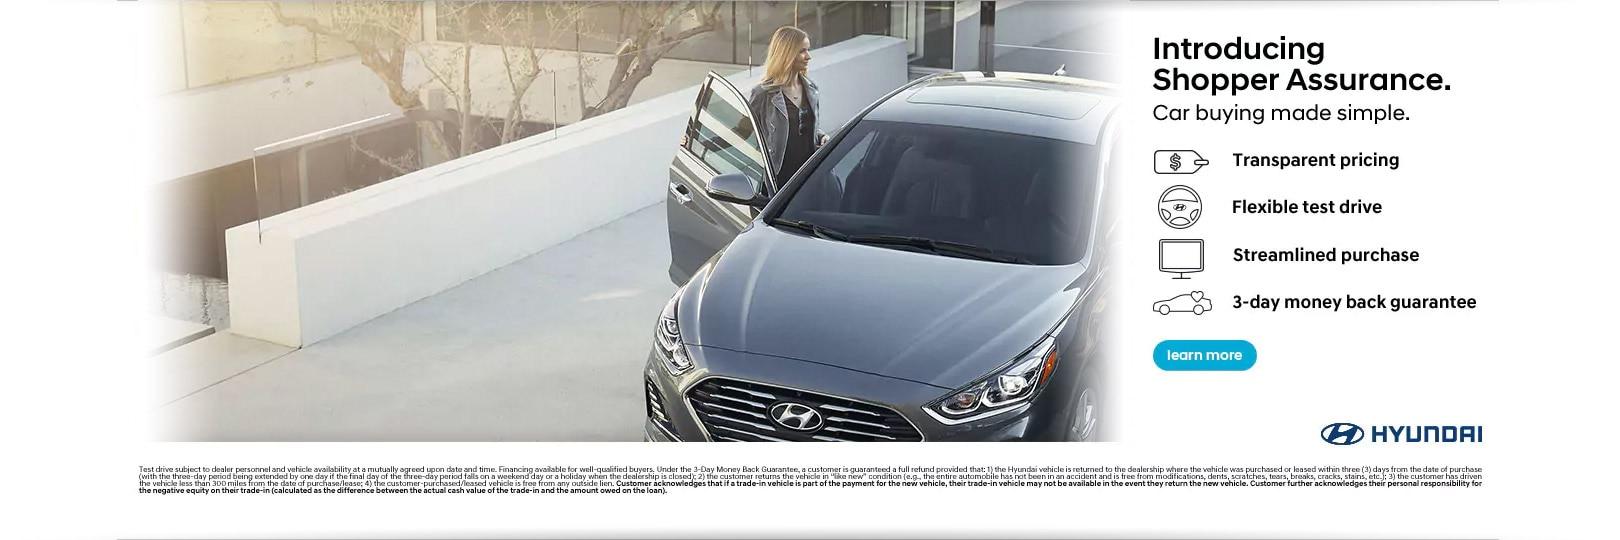 Hyundai Sonata Lease 99 >> McGrath Hyundai of Dubuque | New Genesis, Hyundai dealership in Dubuque, IA 52002